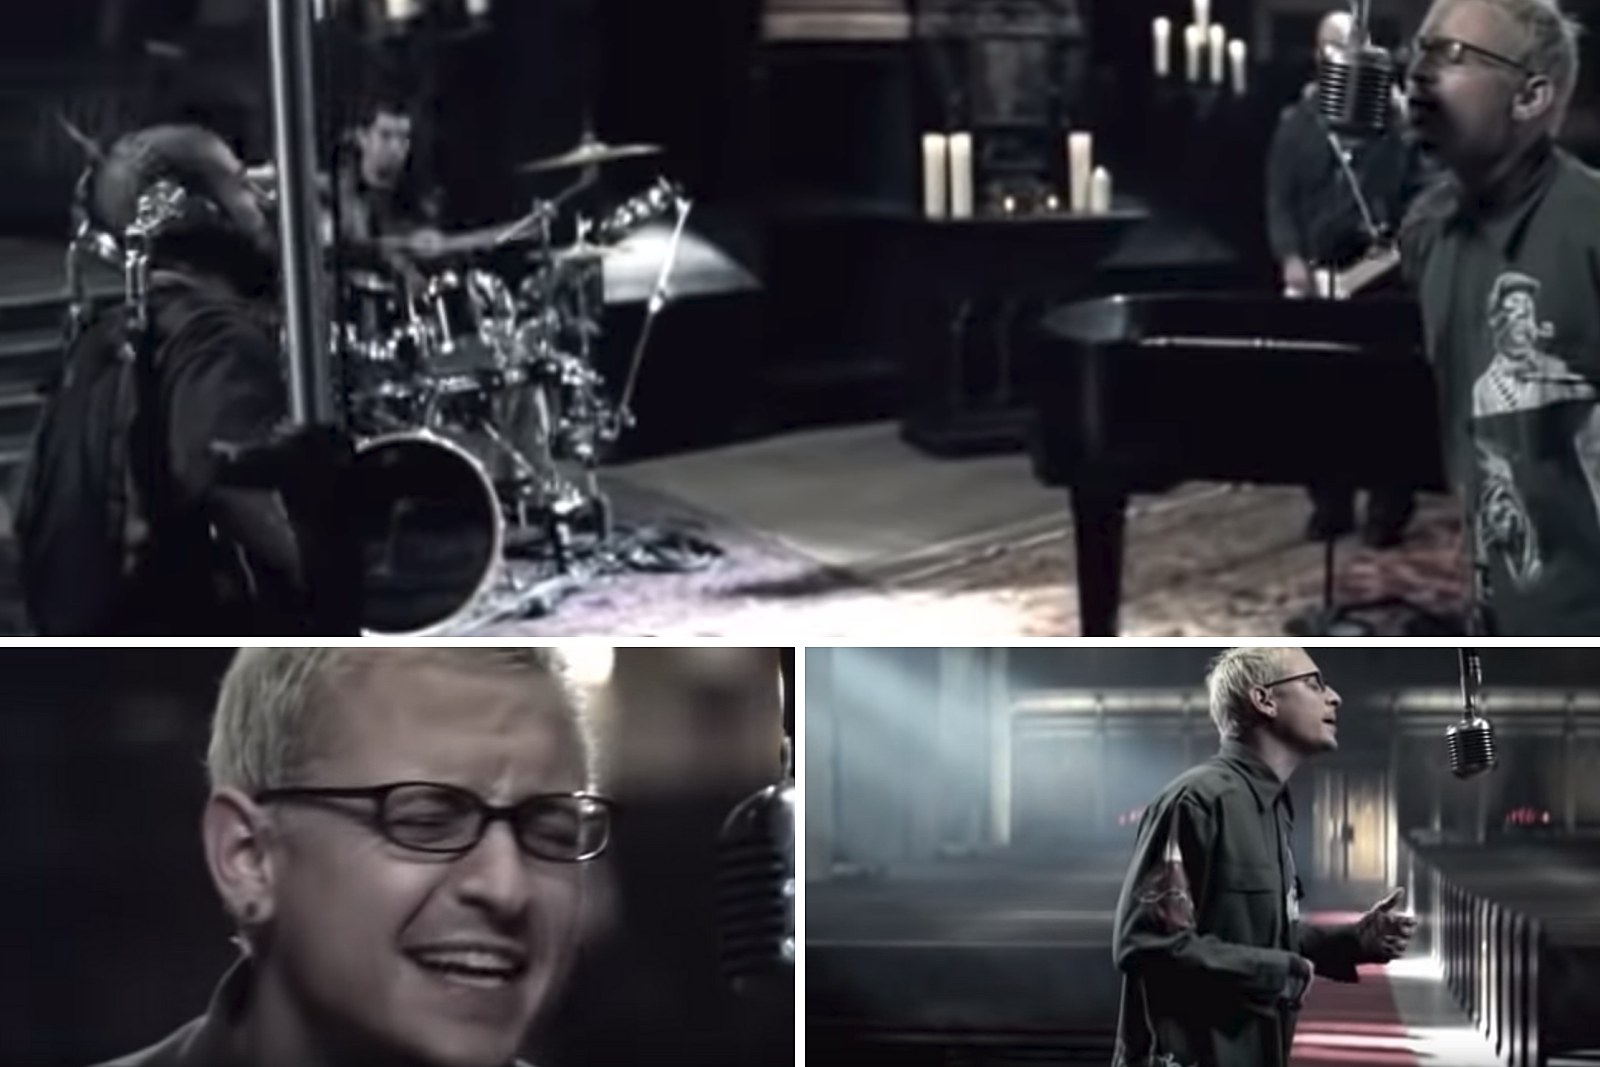 Linkin Park Numb Instrumental Download